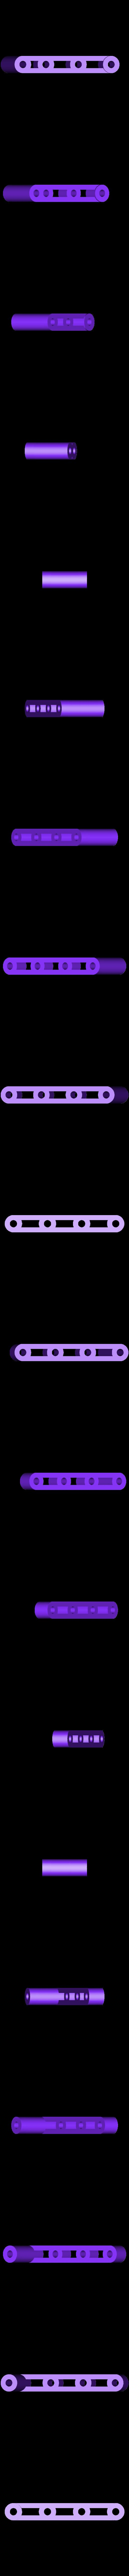 escapeHolderFrame.stl Download free STL file The First Clock • 3D print design, JacquesFavre